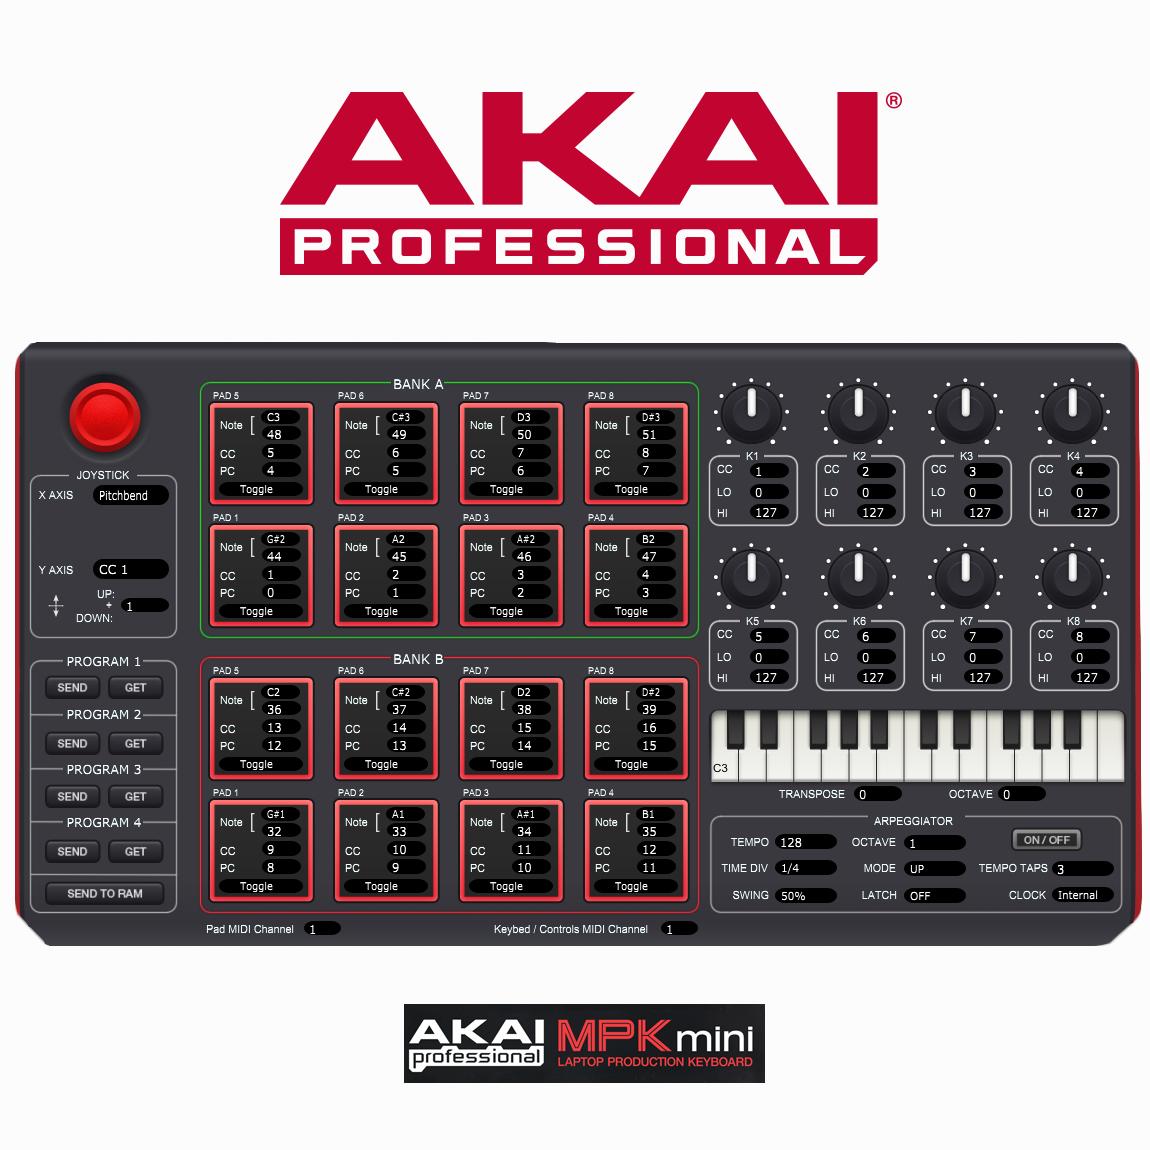 beat music maker dj piano usb midi drum pad keyboard controller joystic 694318015599 ebay. Black Bedroom Furniture Sets. Home Design Ideas